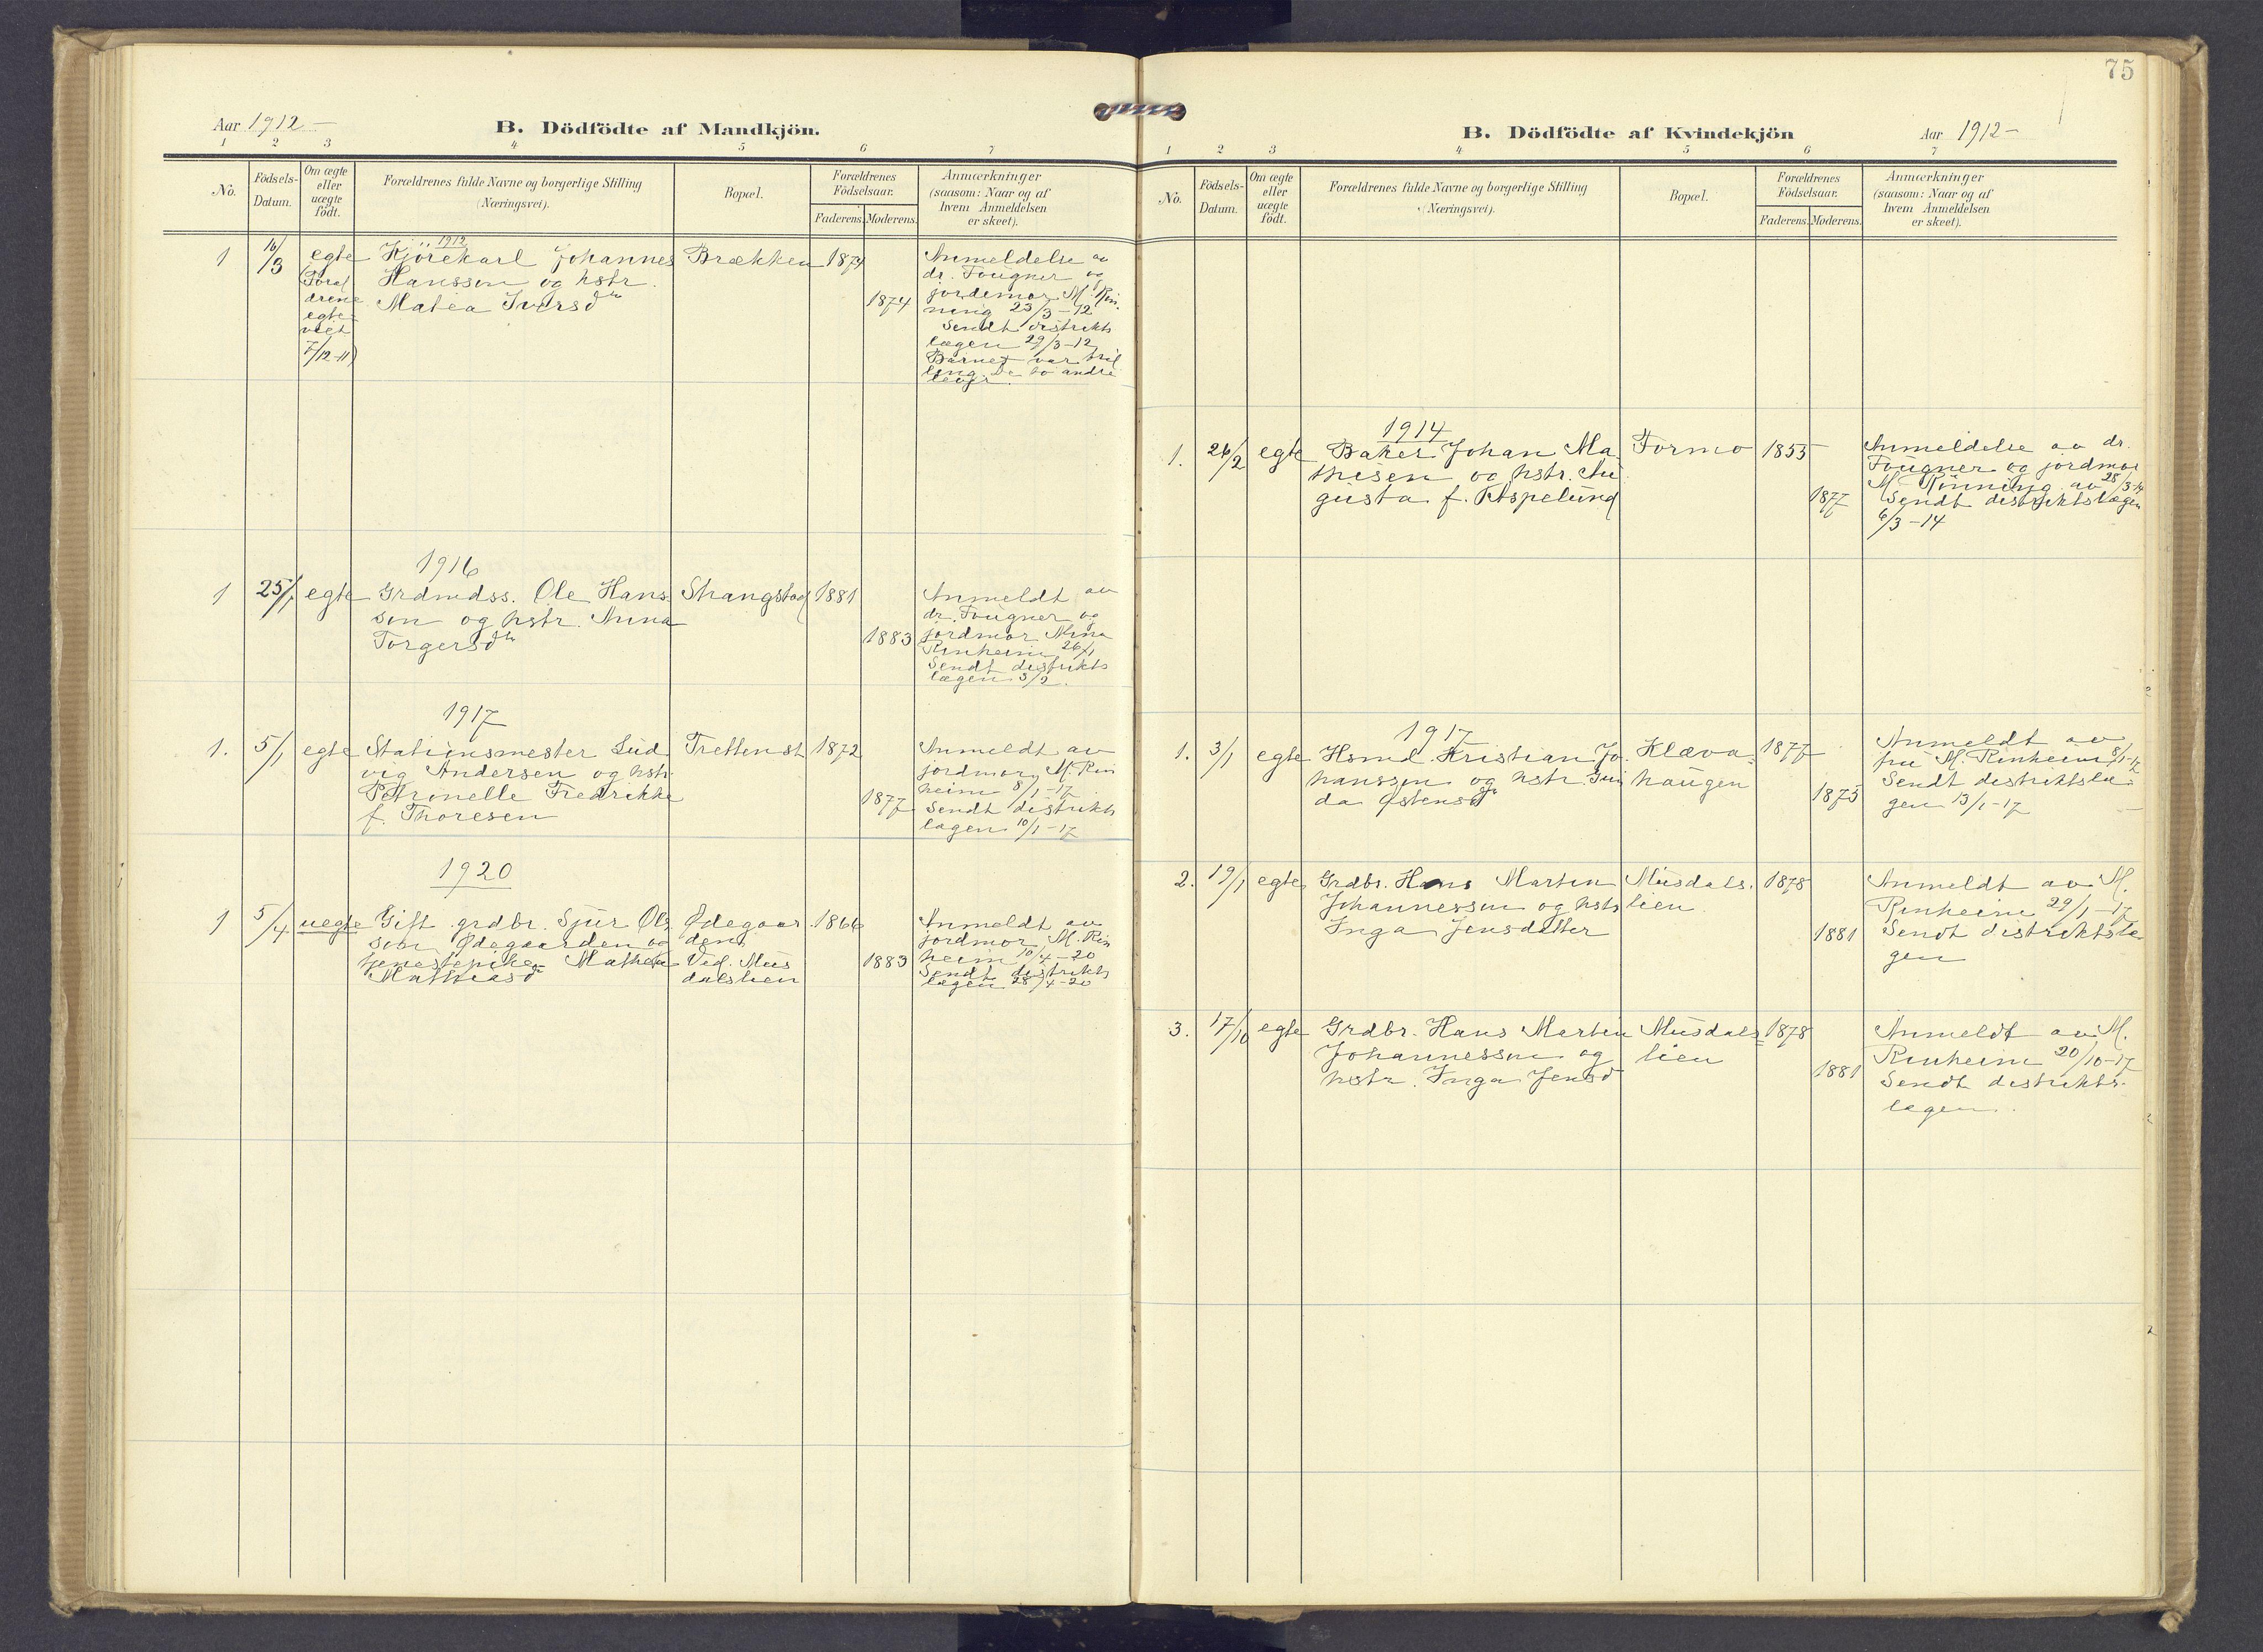 SAH, Øyer prestekontor, Ministerialbok nr. 13, 1905-1920, s. 75